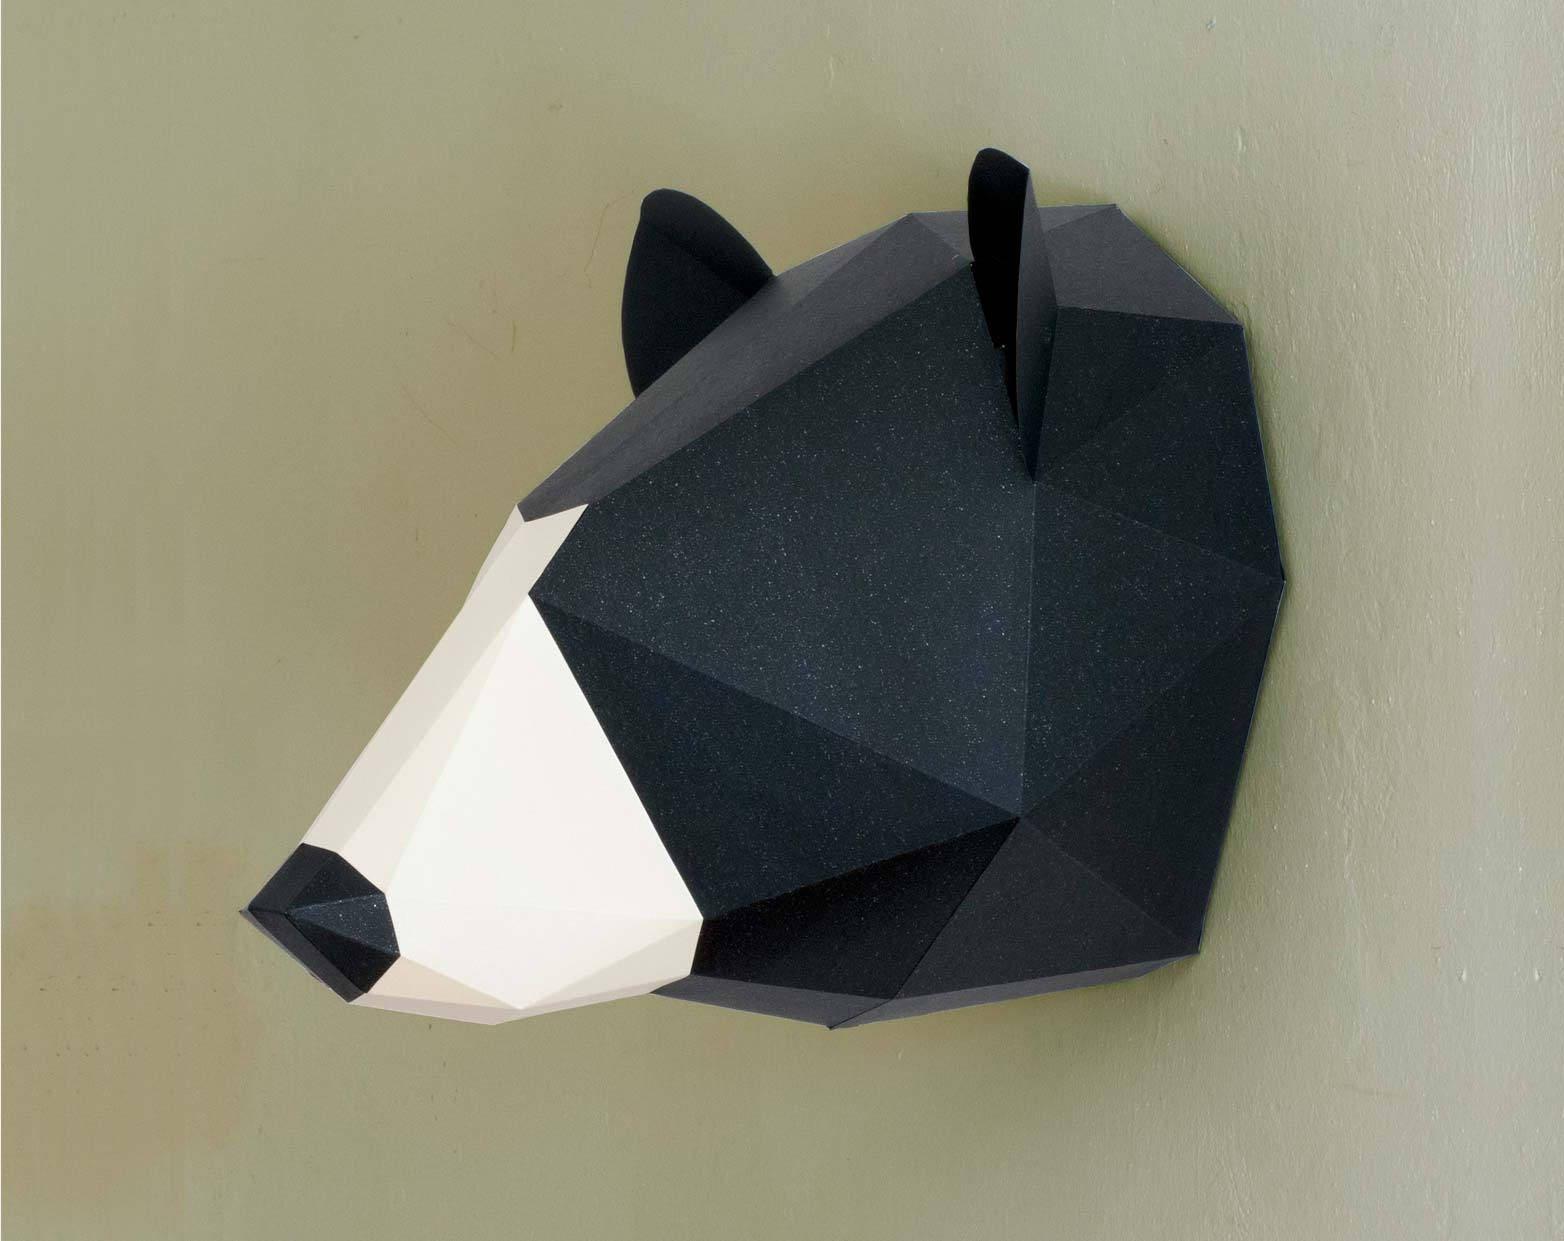 Black bear decor 3d papercraft bear art bear ornament zoom amipublicfo Choice Image